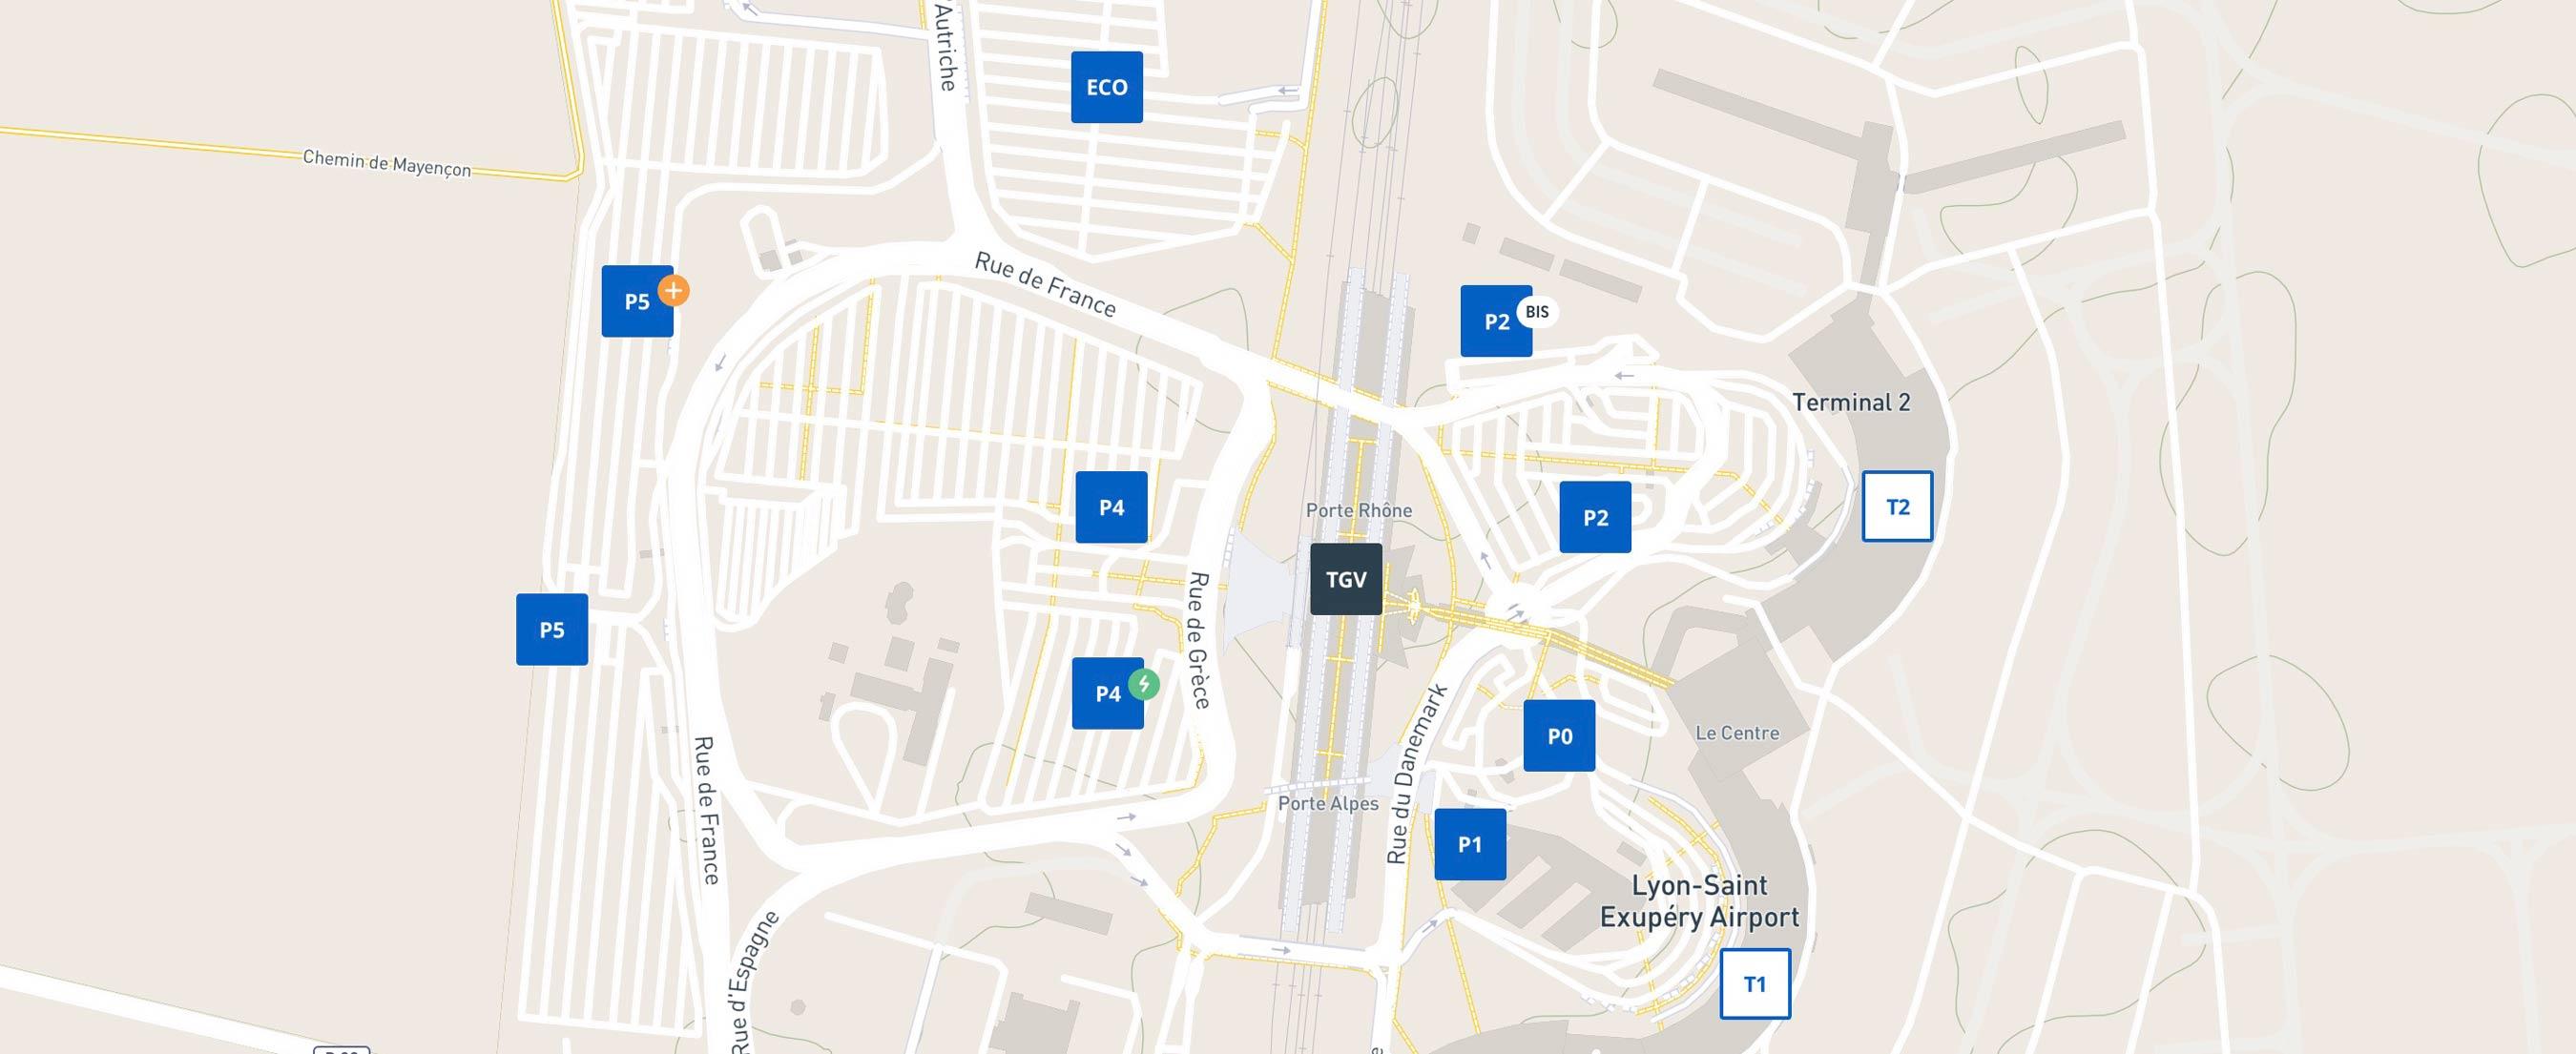 parking-map-desktop-01.jpg